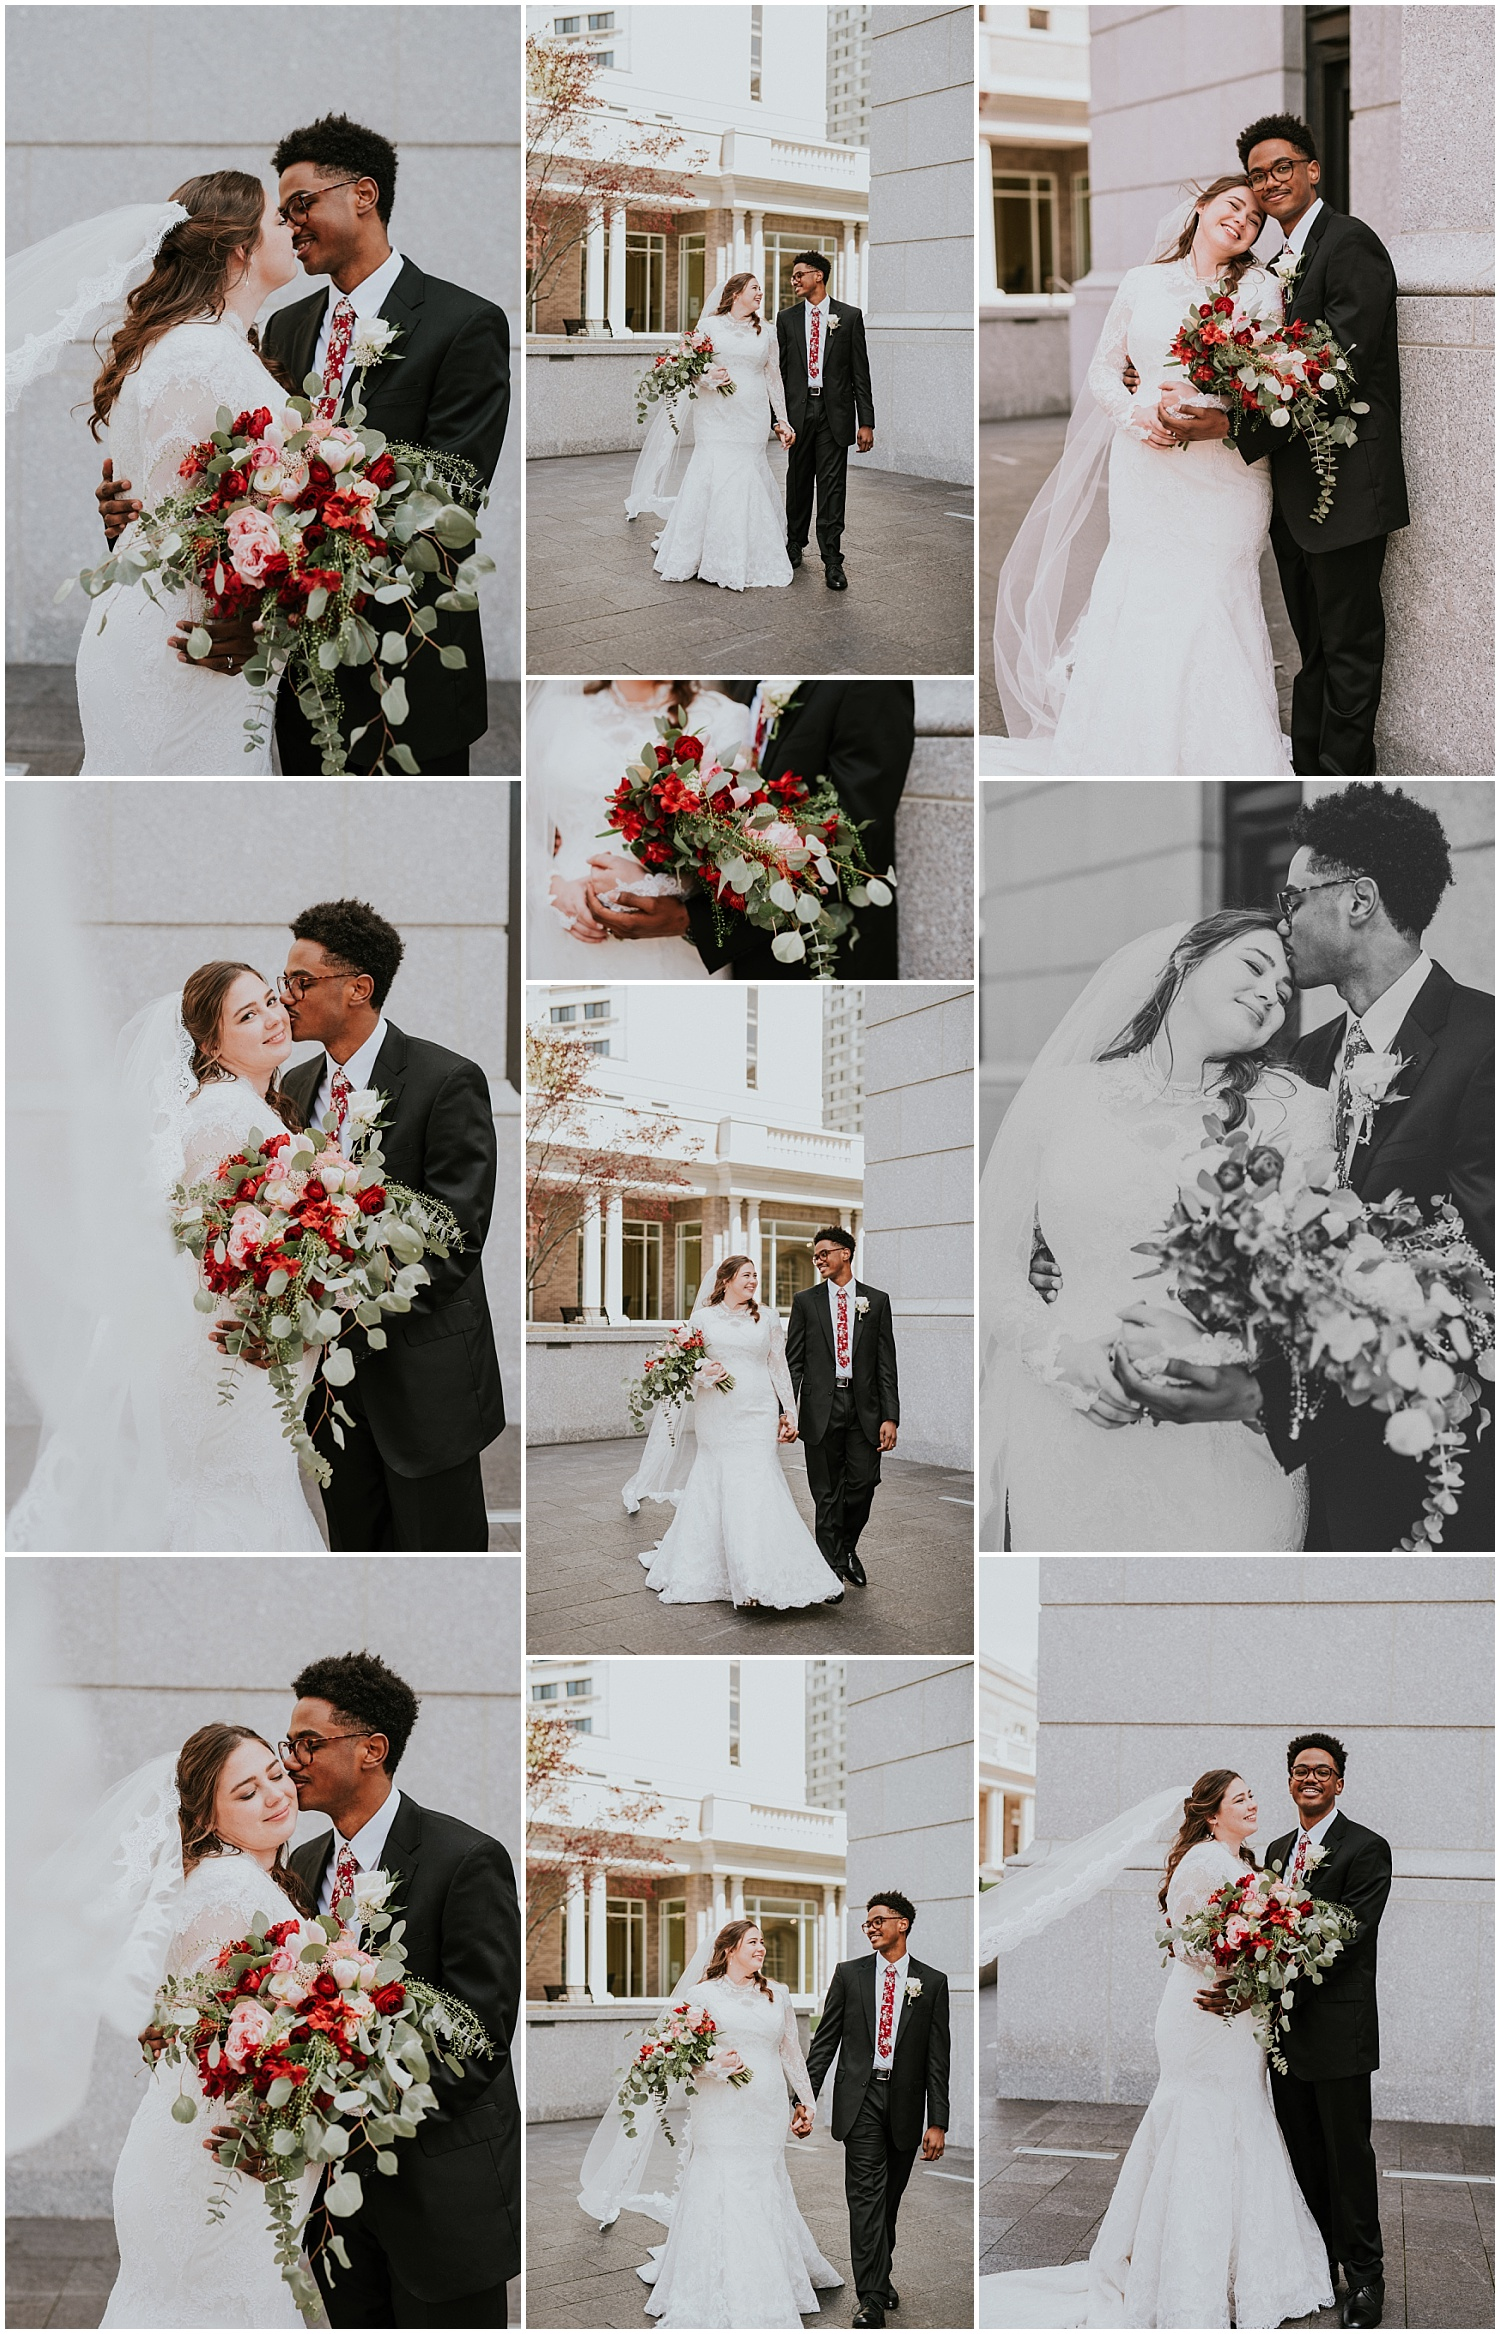 ariannabellephotography-philadelphia LDS wedding (5).jpg